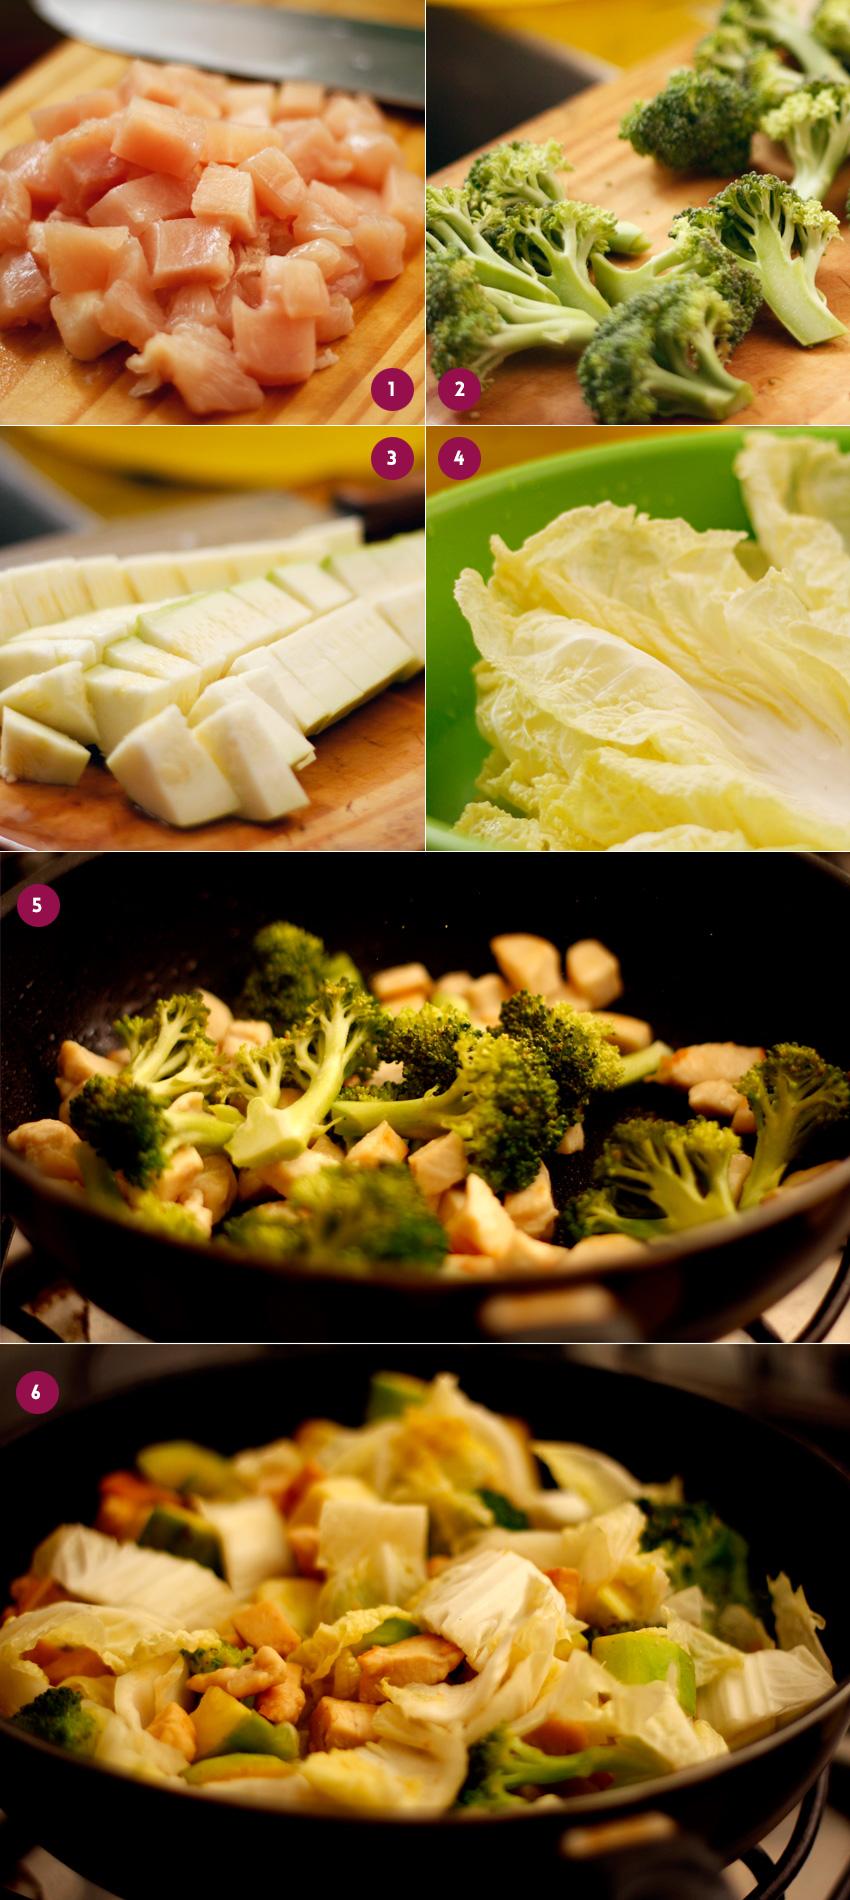 receita-frango-vegetais-2